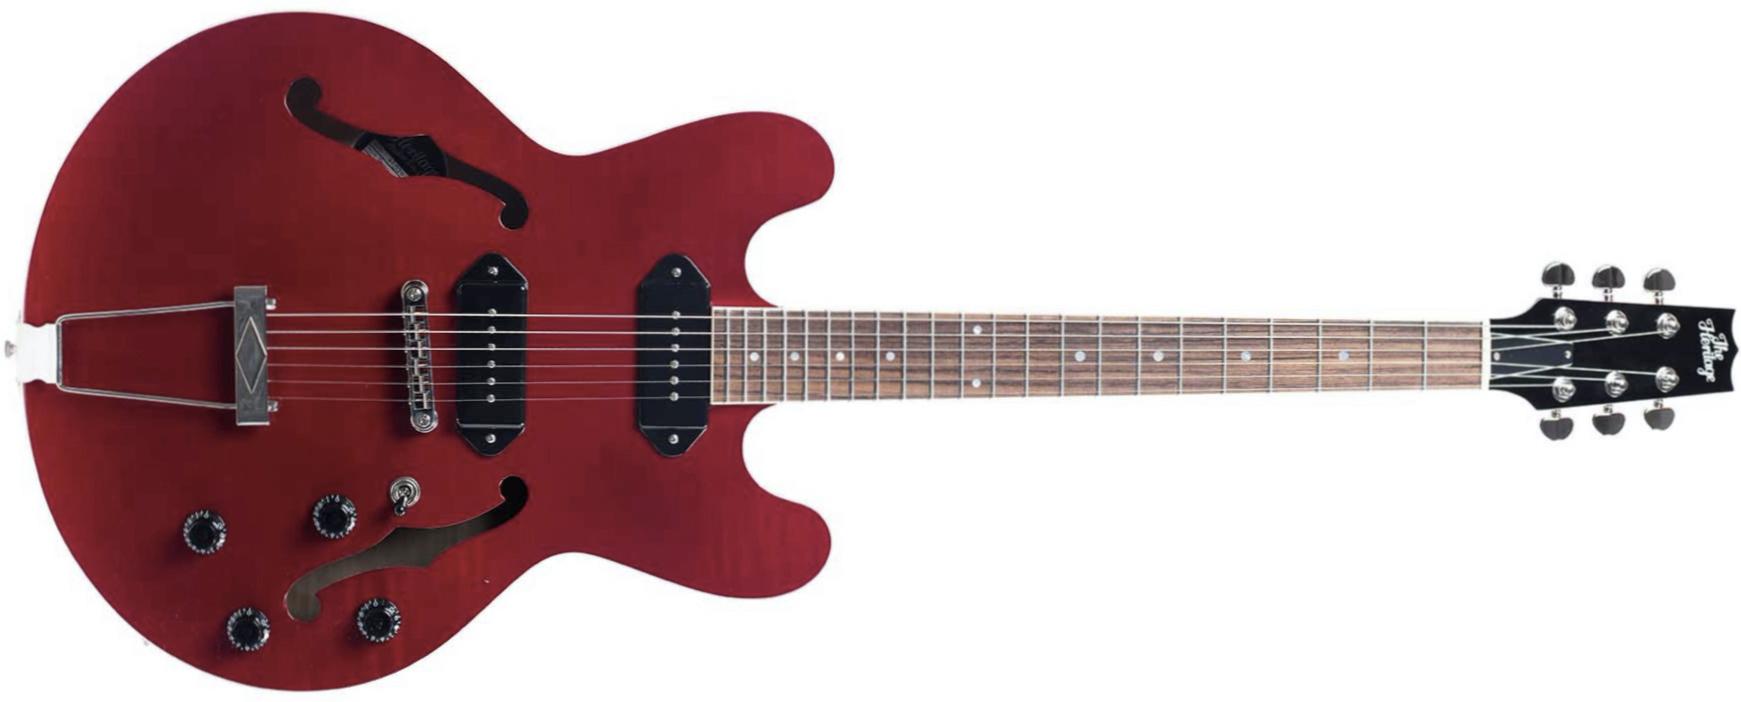 Heritage Guitars H-530